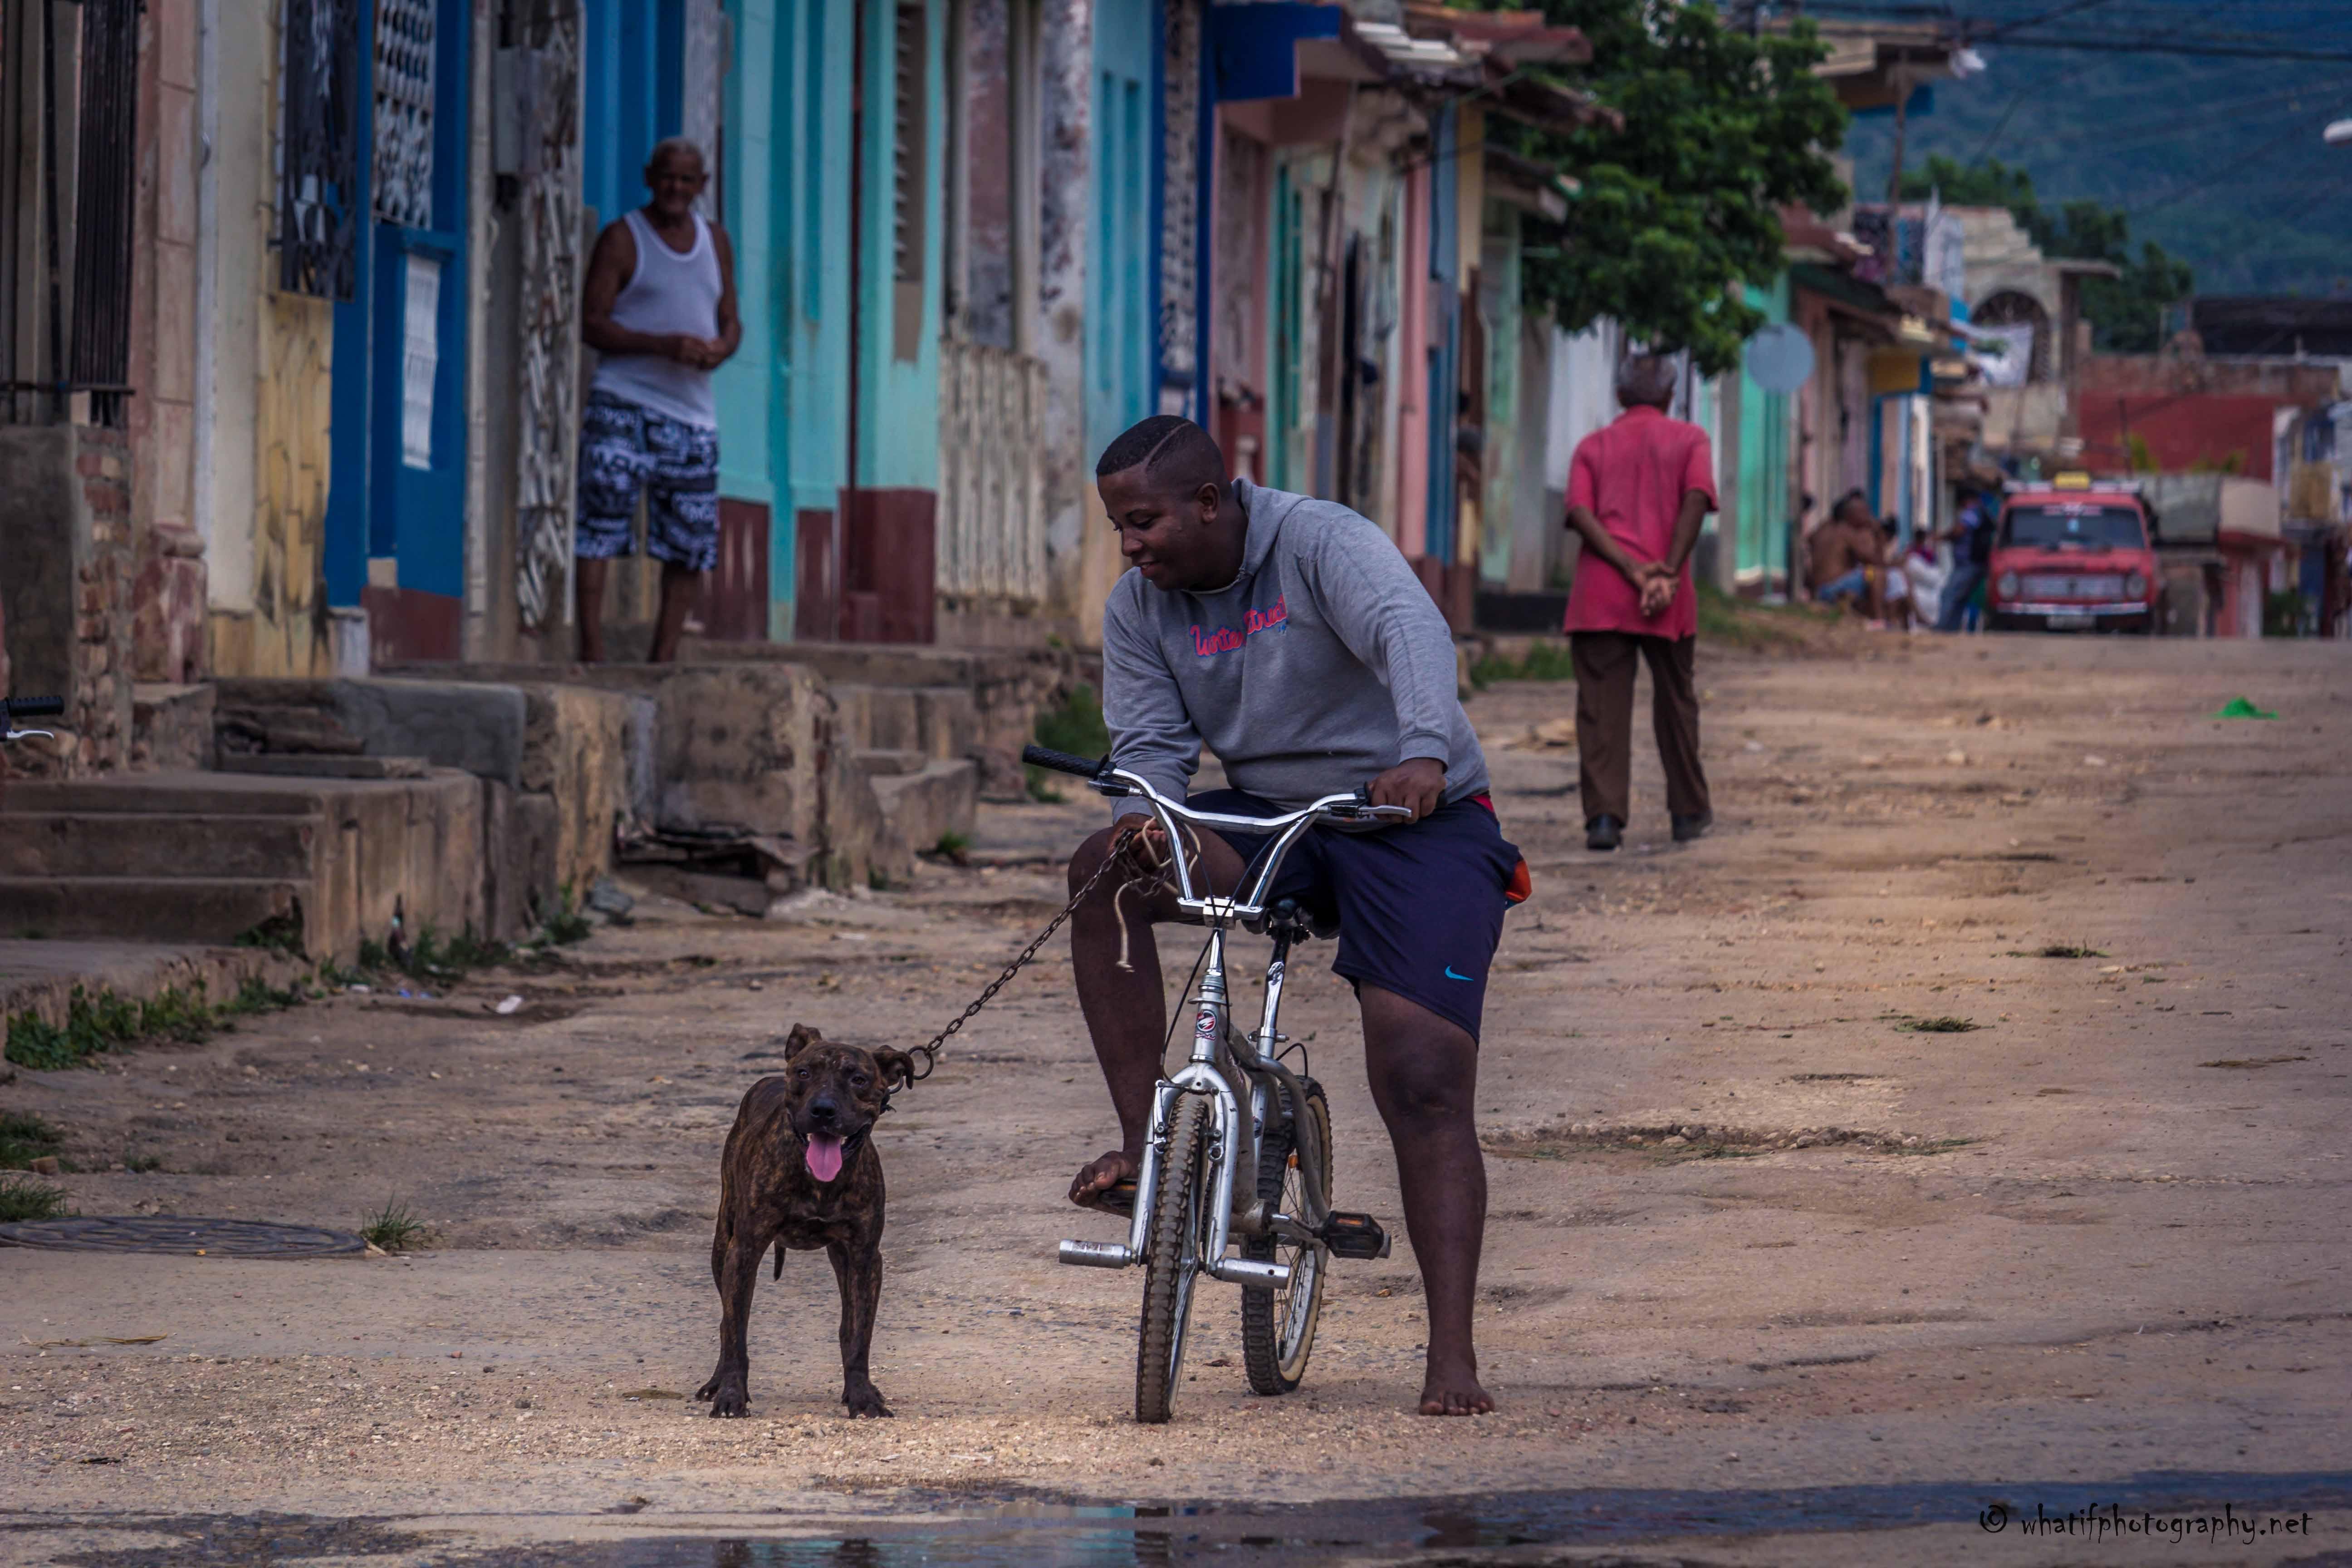 Friendship found on the street of Trinid